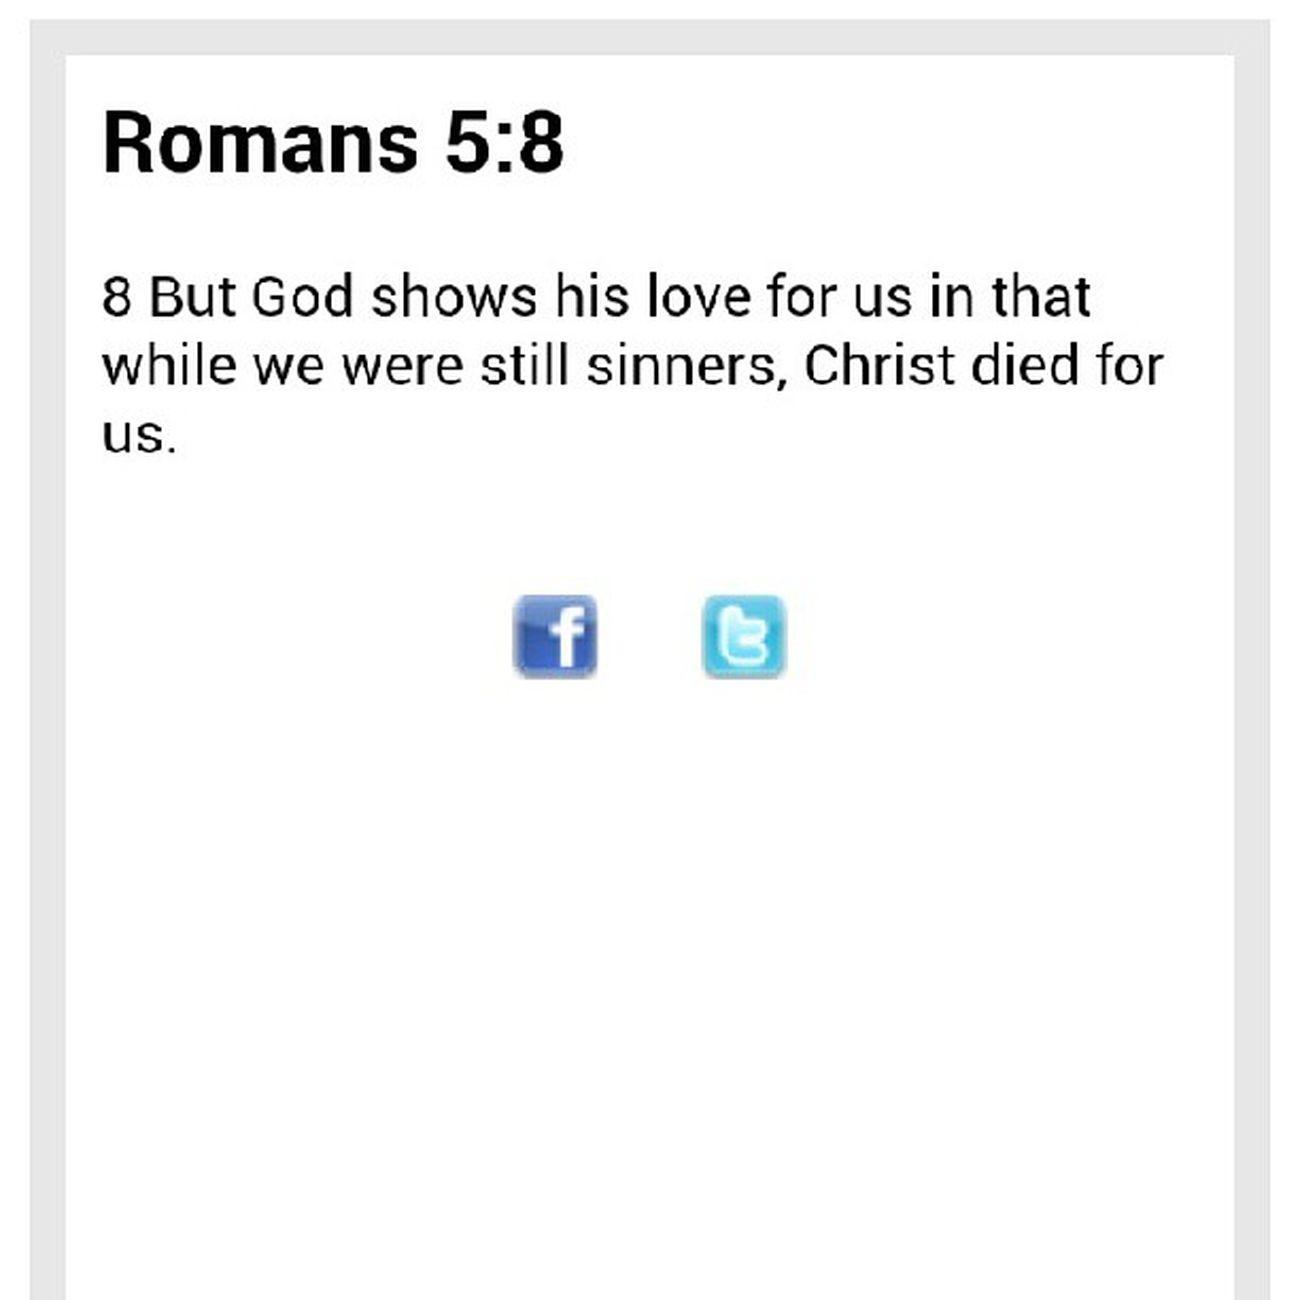 DailyBible - Romans 5:8